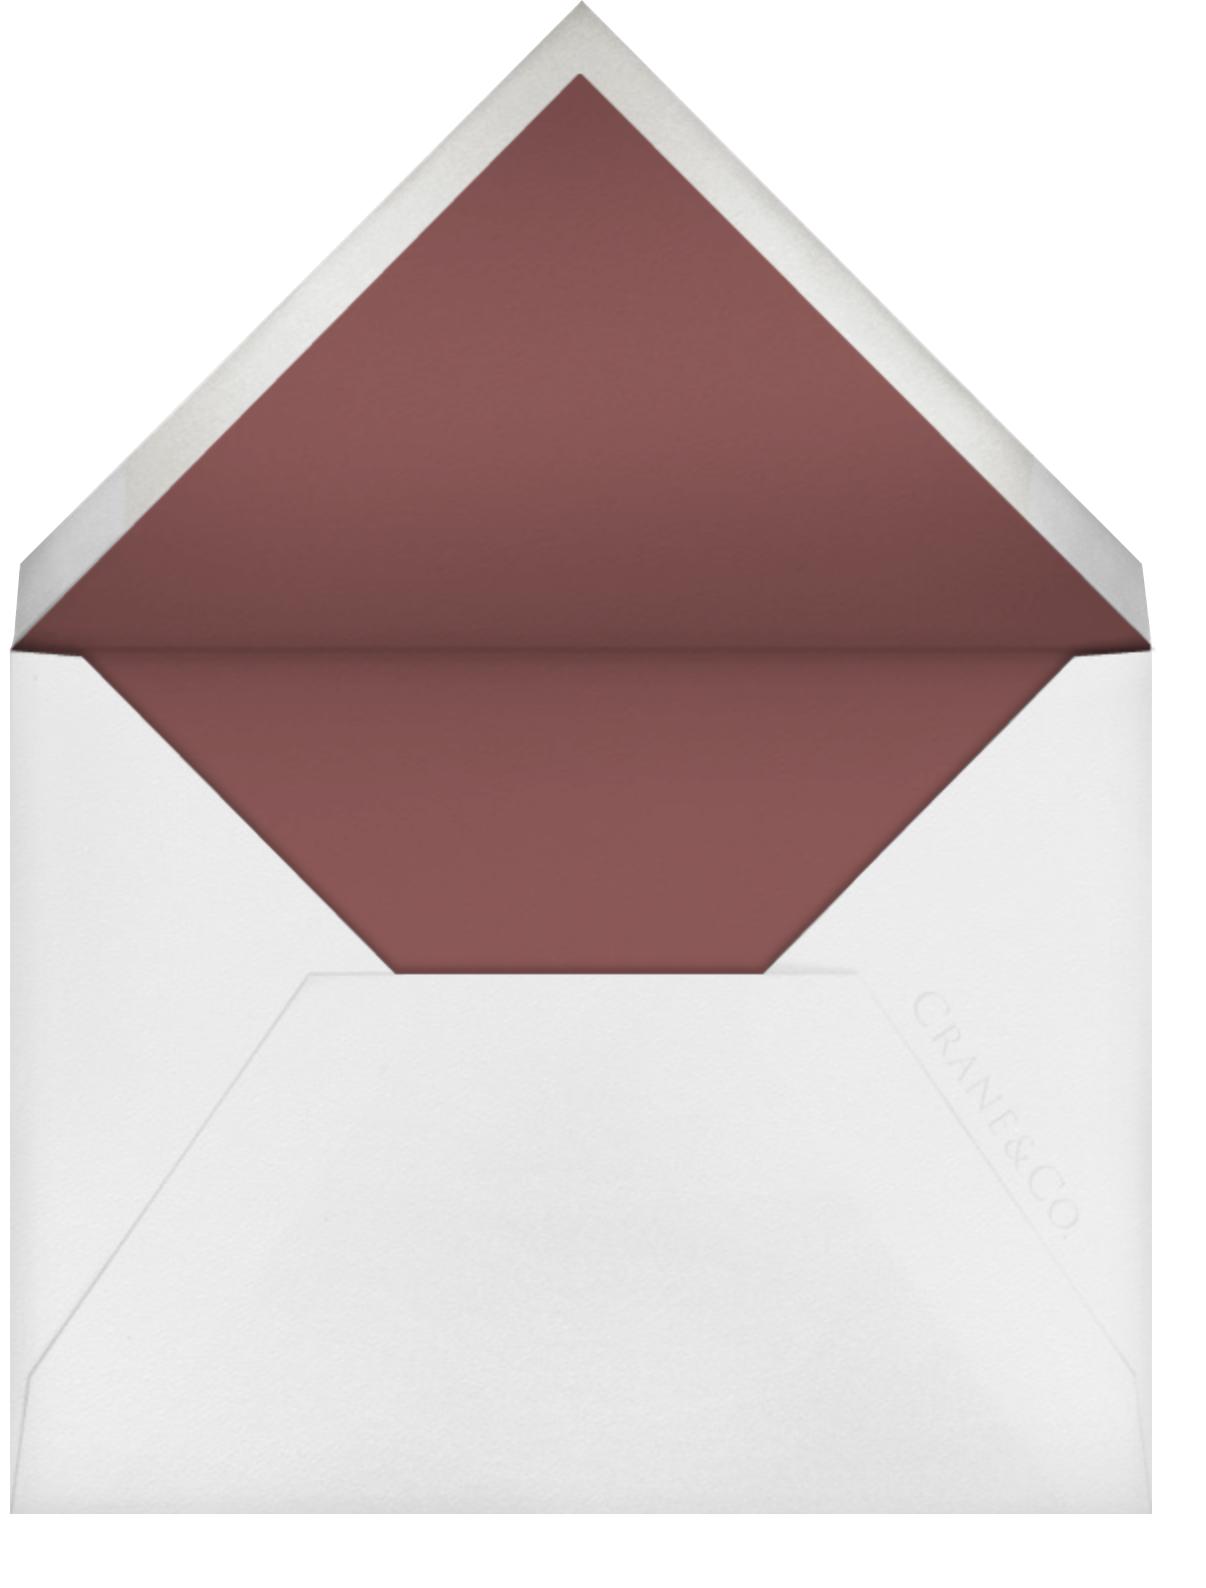 Painted Border - Kona - Paperless Post - Personalized stationery - envelope back